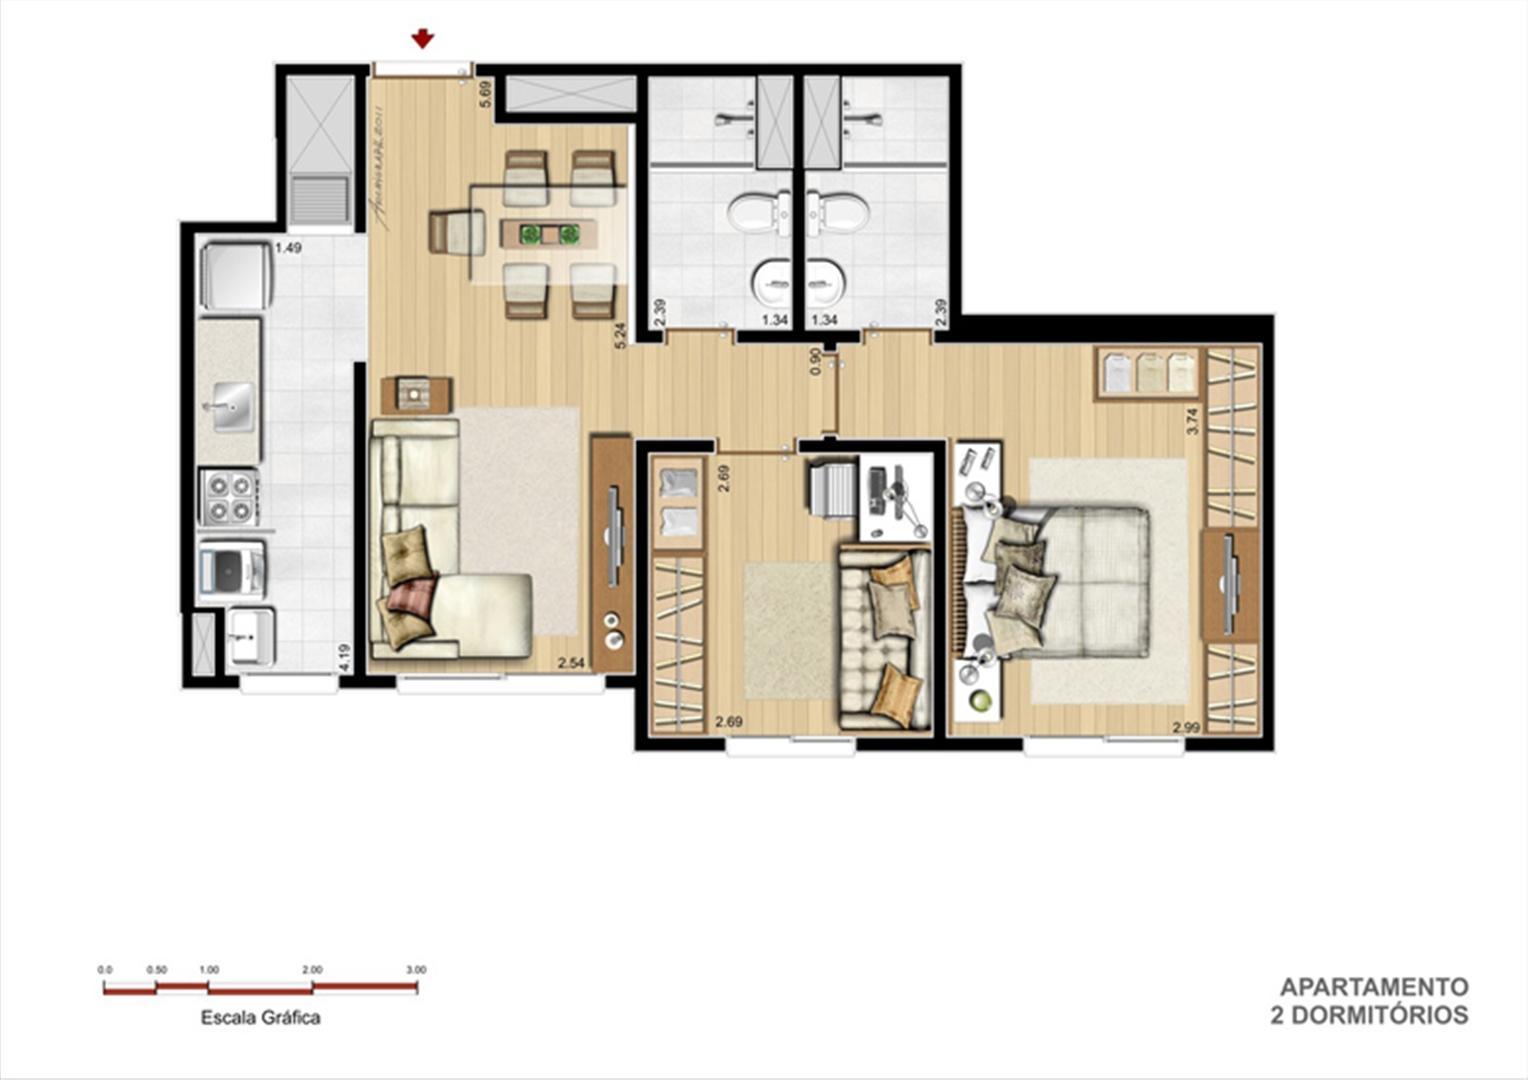 Tipo 2 dormitórios | Supera Condomínio Clube – Apartamento  próximo ao Zaffari Zona Sul - Porto Alegre - Rio Grande do Sul